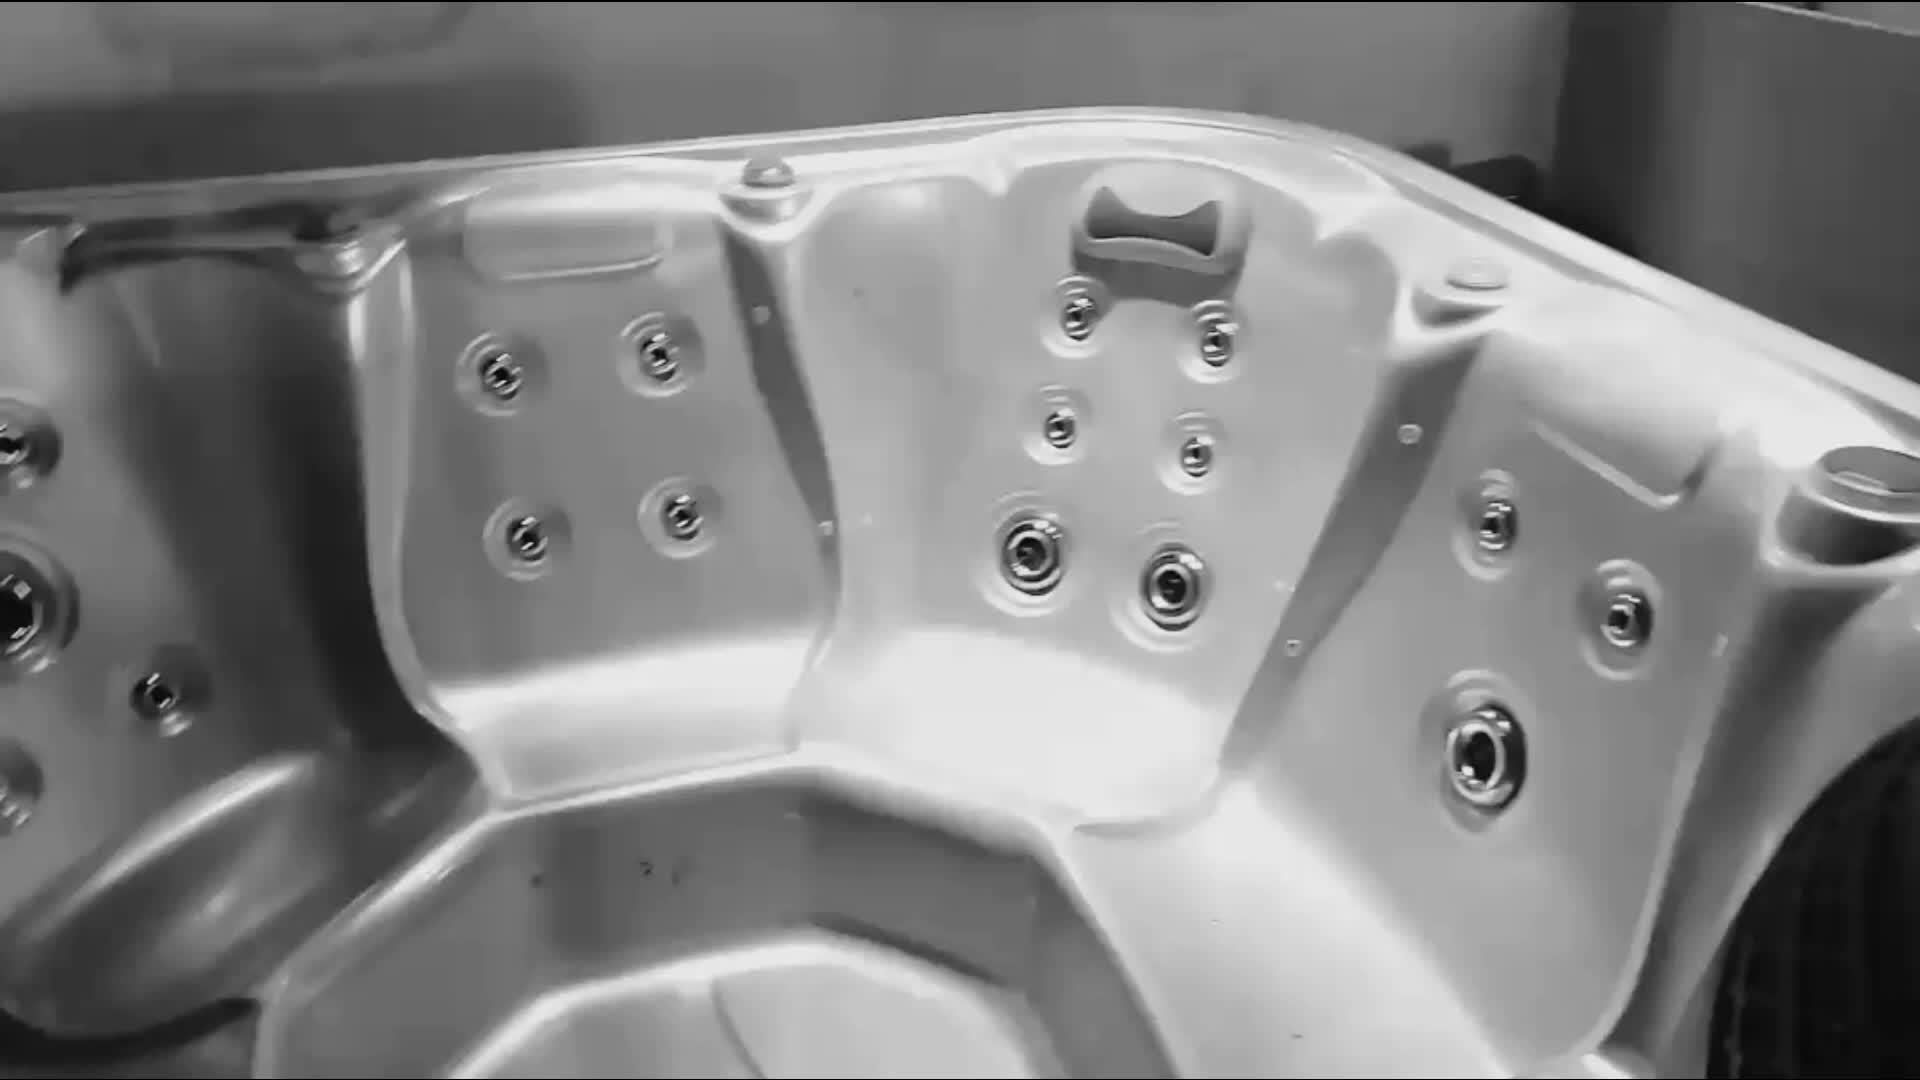 Sunrans 6 người ngoài trời whirlpool massage spa bồn